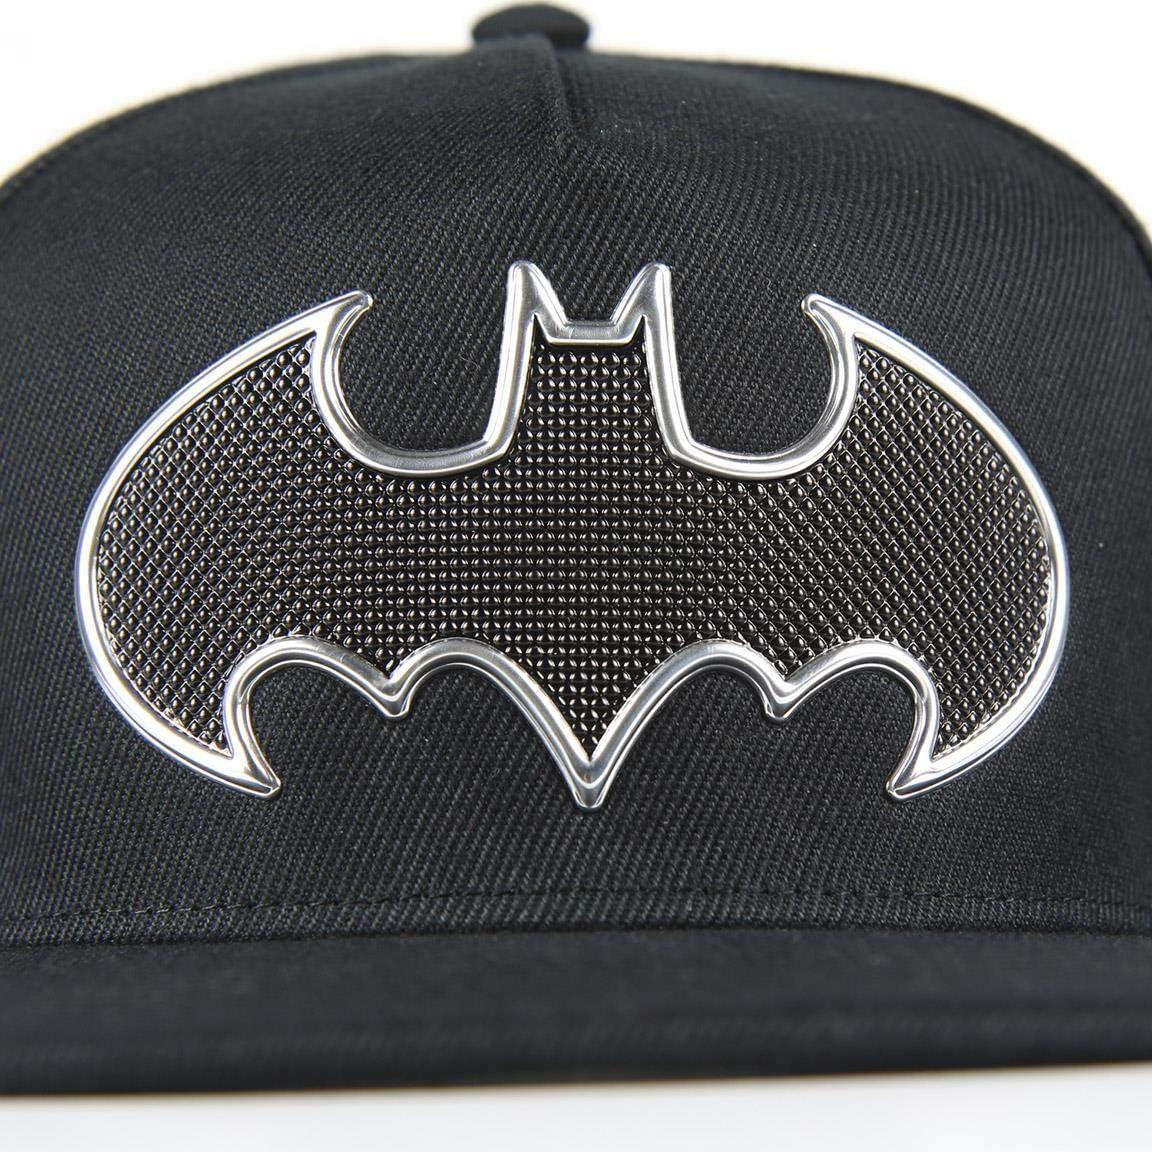 Taglia Produttore: 56 Gris Gris Artesania Cerda Gorra Visera Plana Logo Batman Cappellopello Medium Grigio Bambino